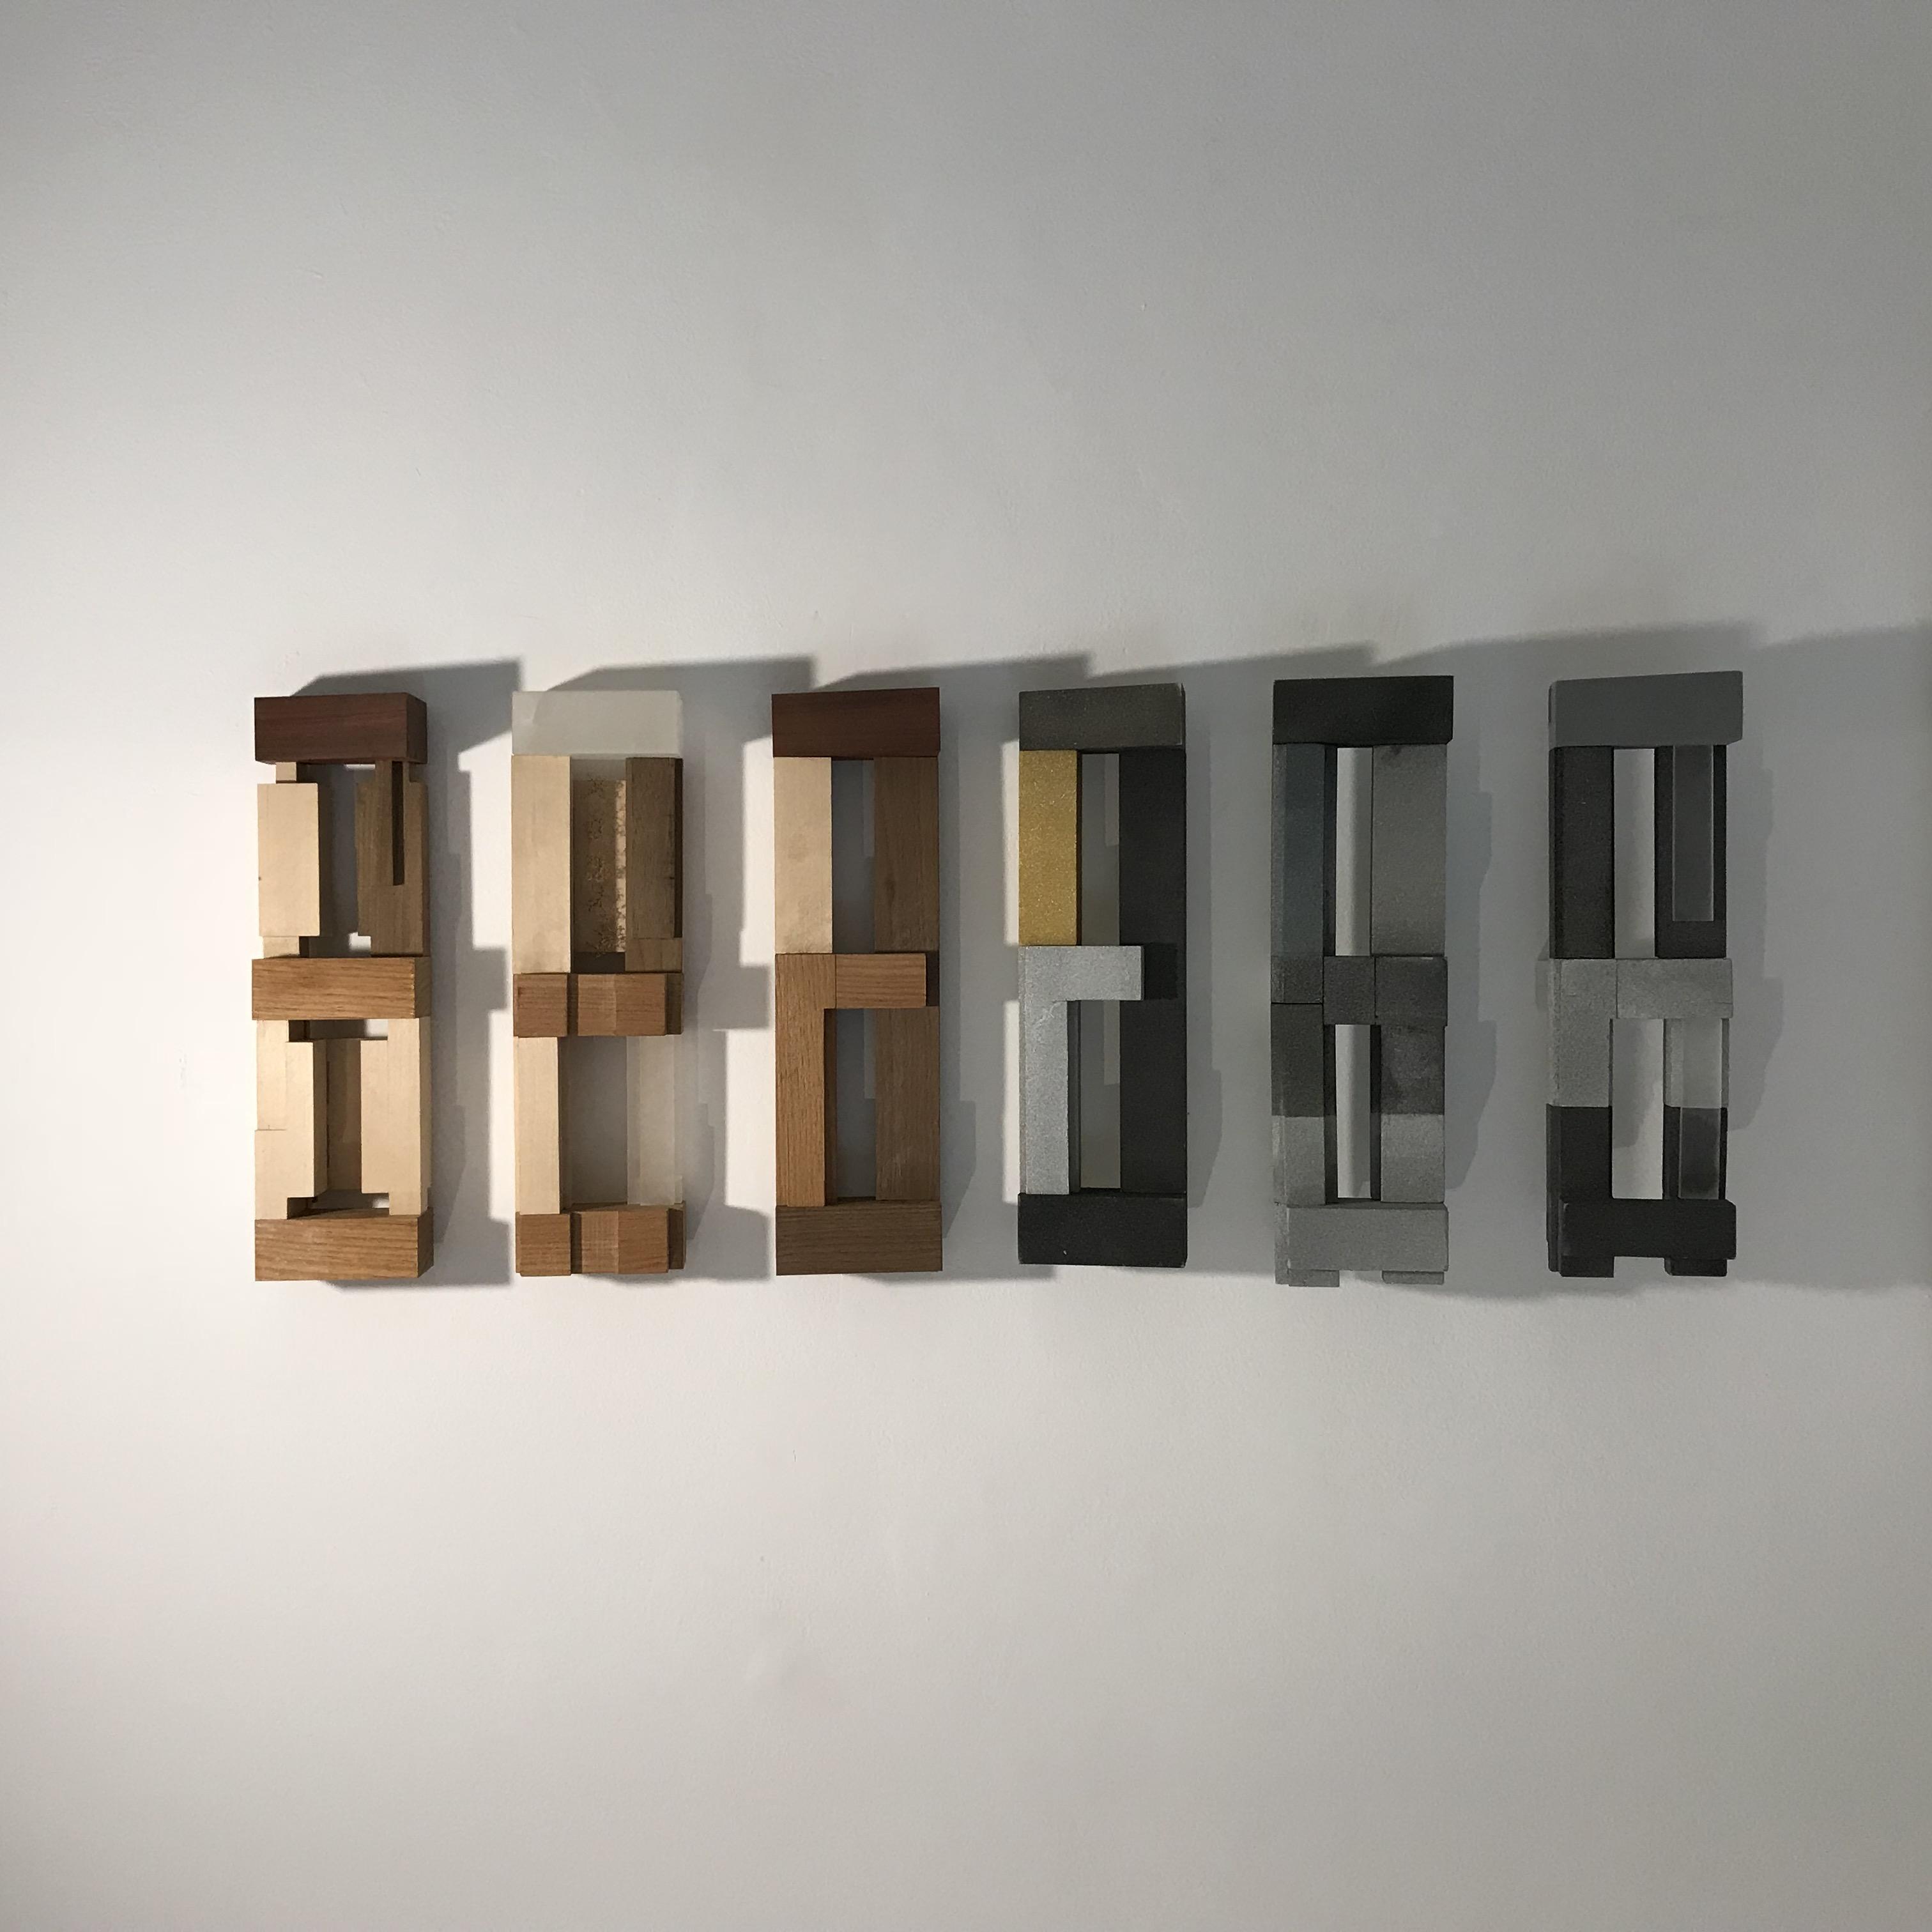 5-jose-luis-mateo-rardo-architects-expo-arquitectos-en-sitgesjoan-prats